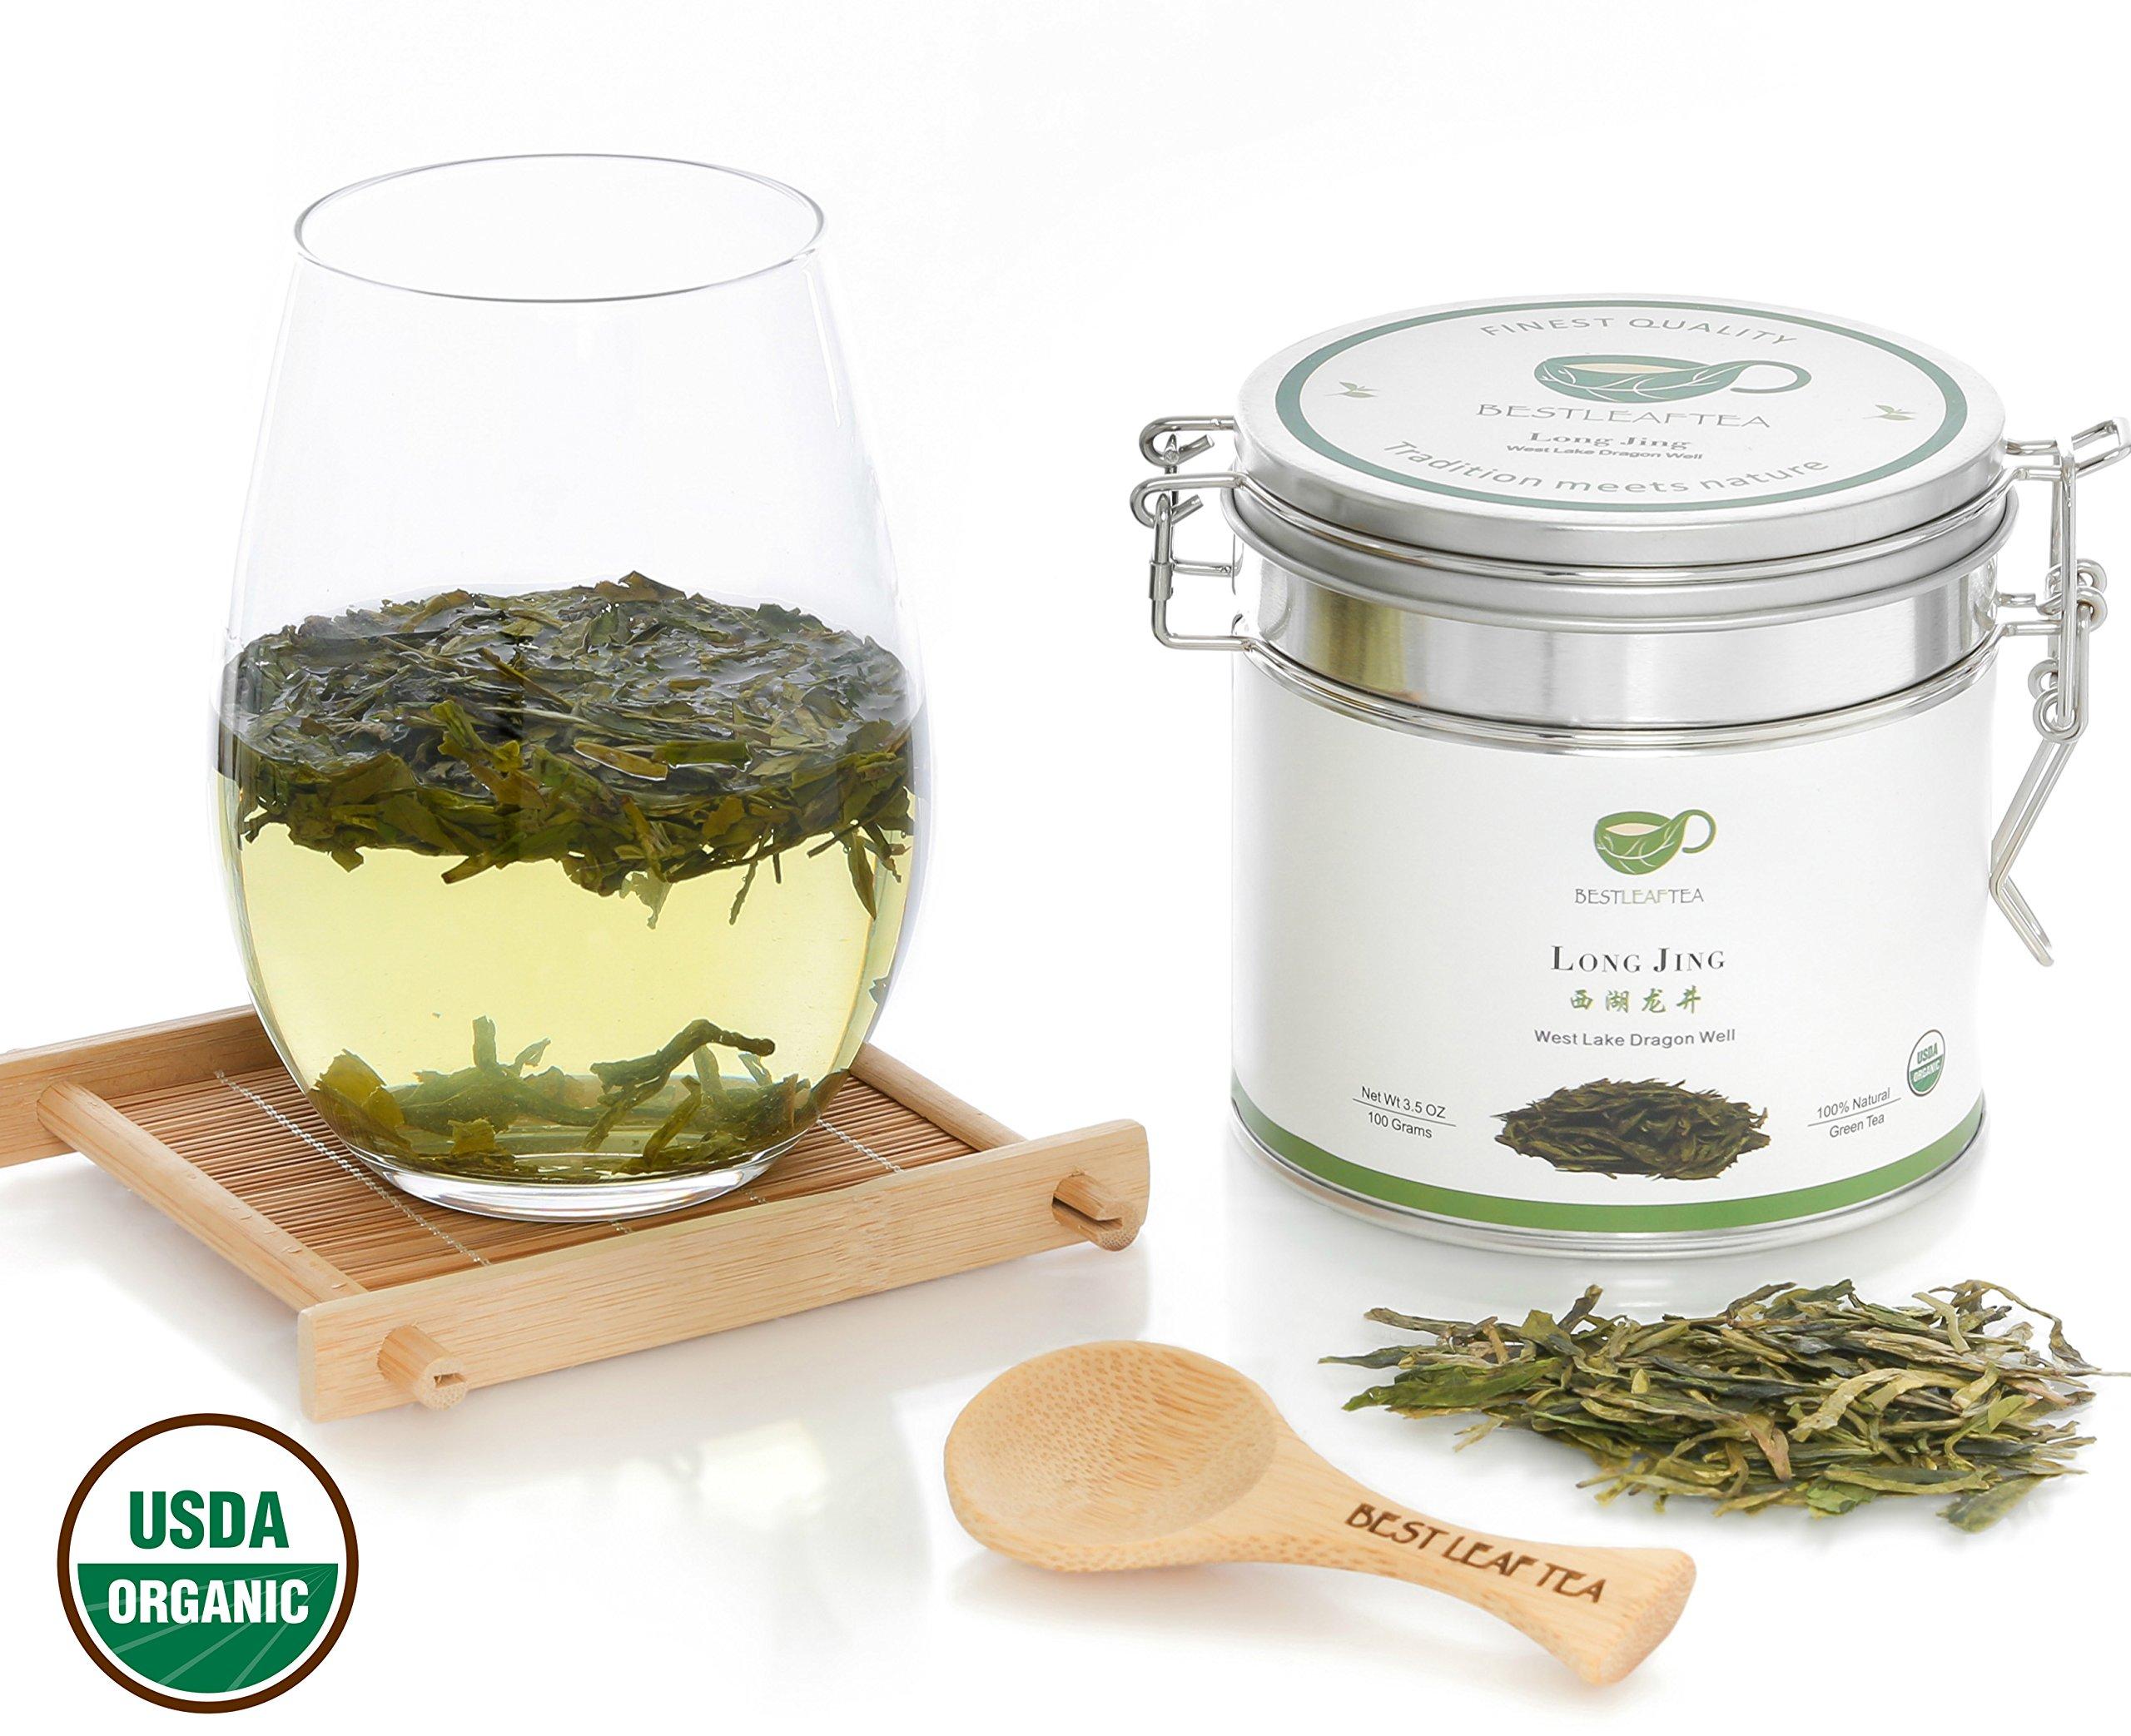 BESTLEAFTEA- 2018 Spring Picked Organic DragonWell/Longjing Green Tea 3.5Oz/100g